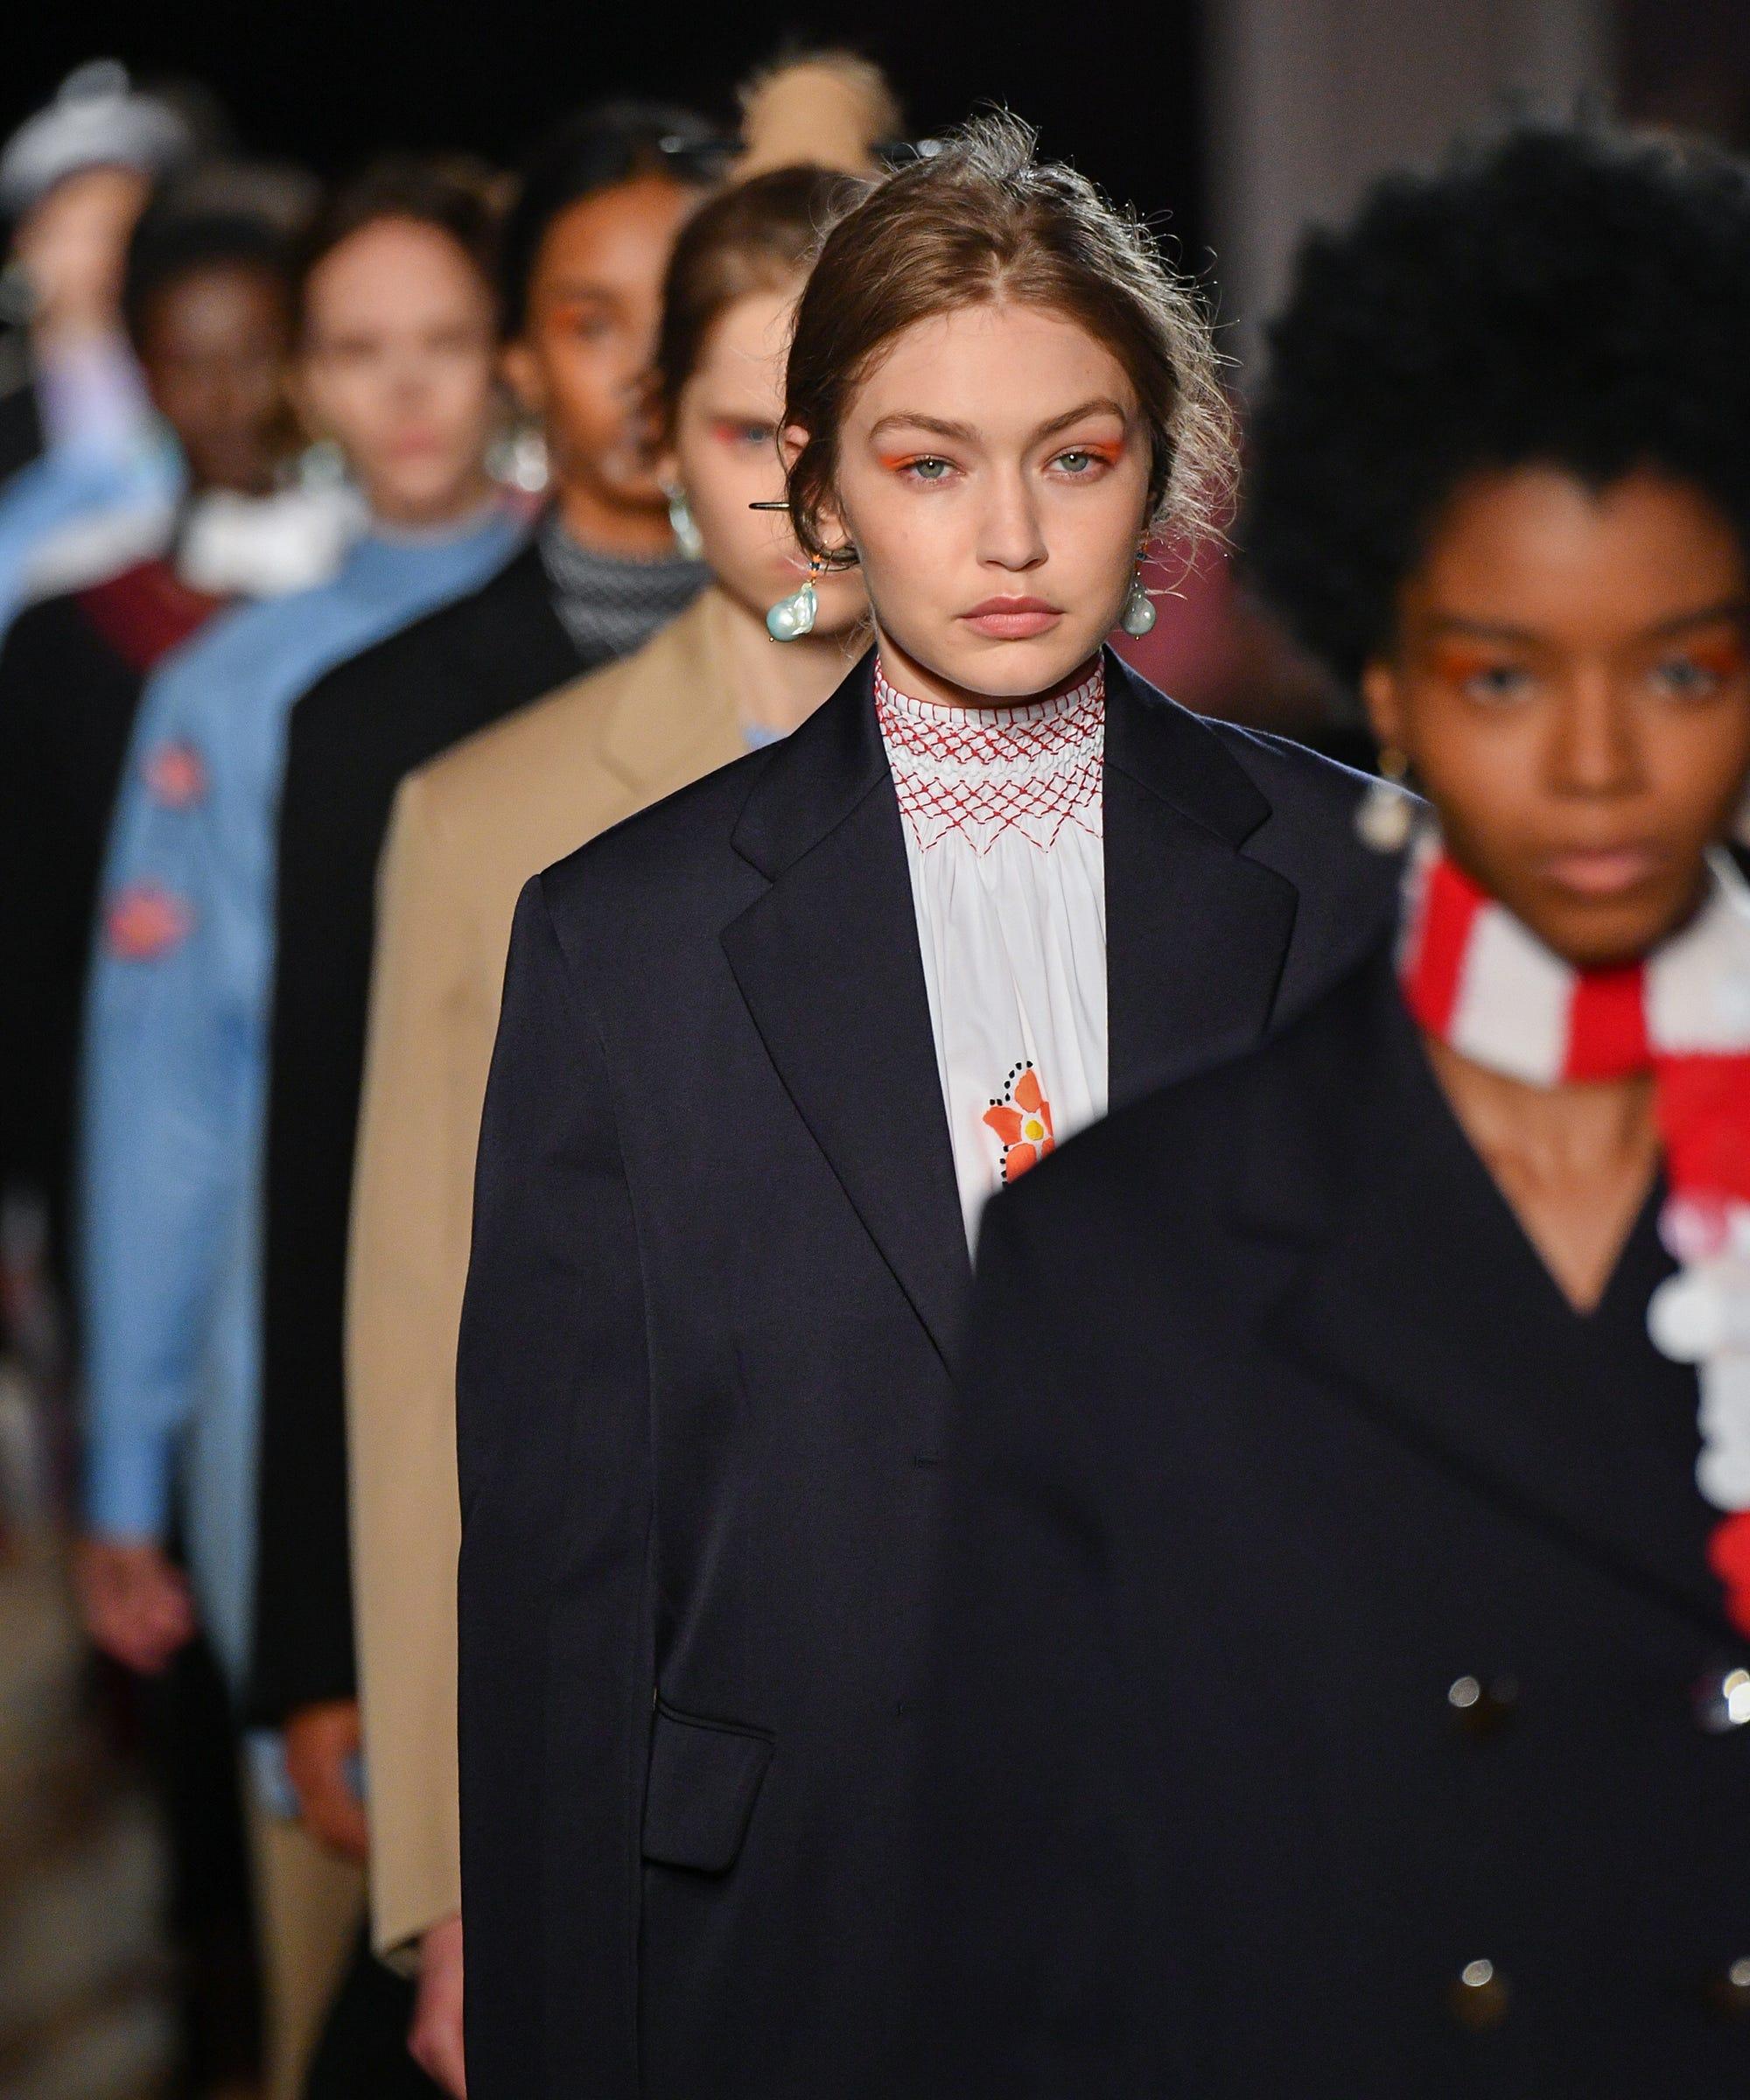 Prada Is The Latest Fashion House To Go Fur-Free